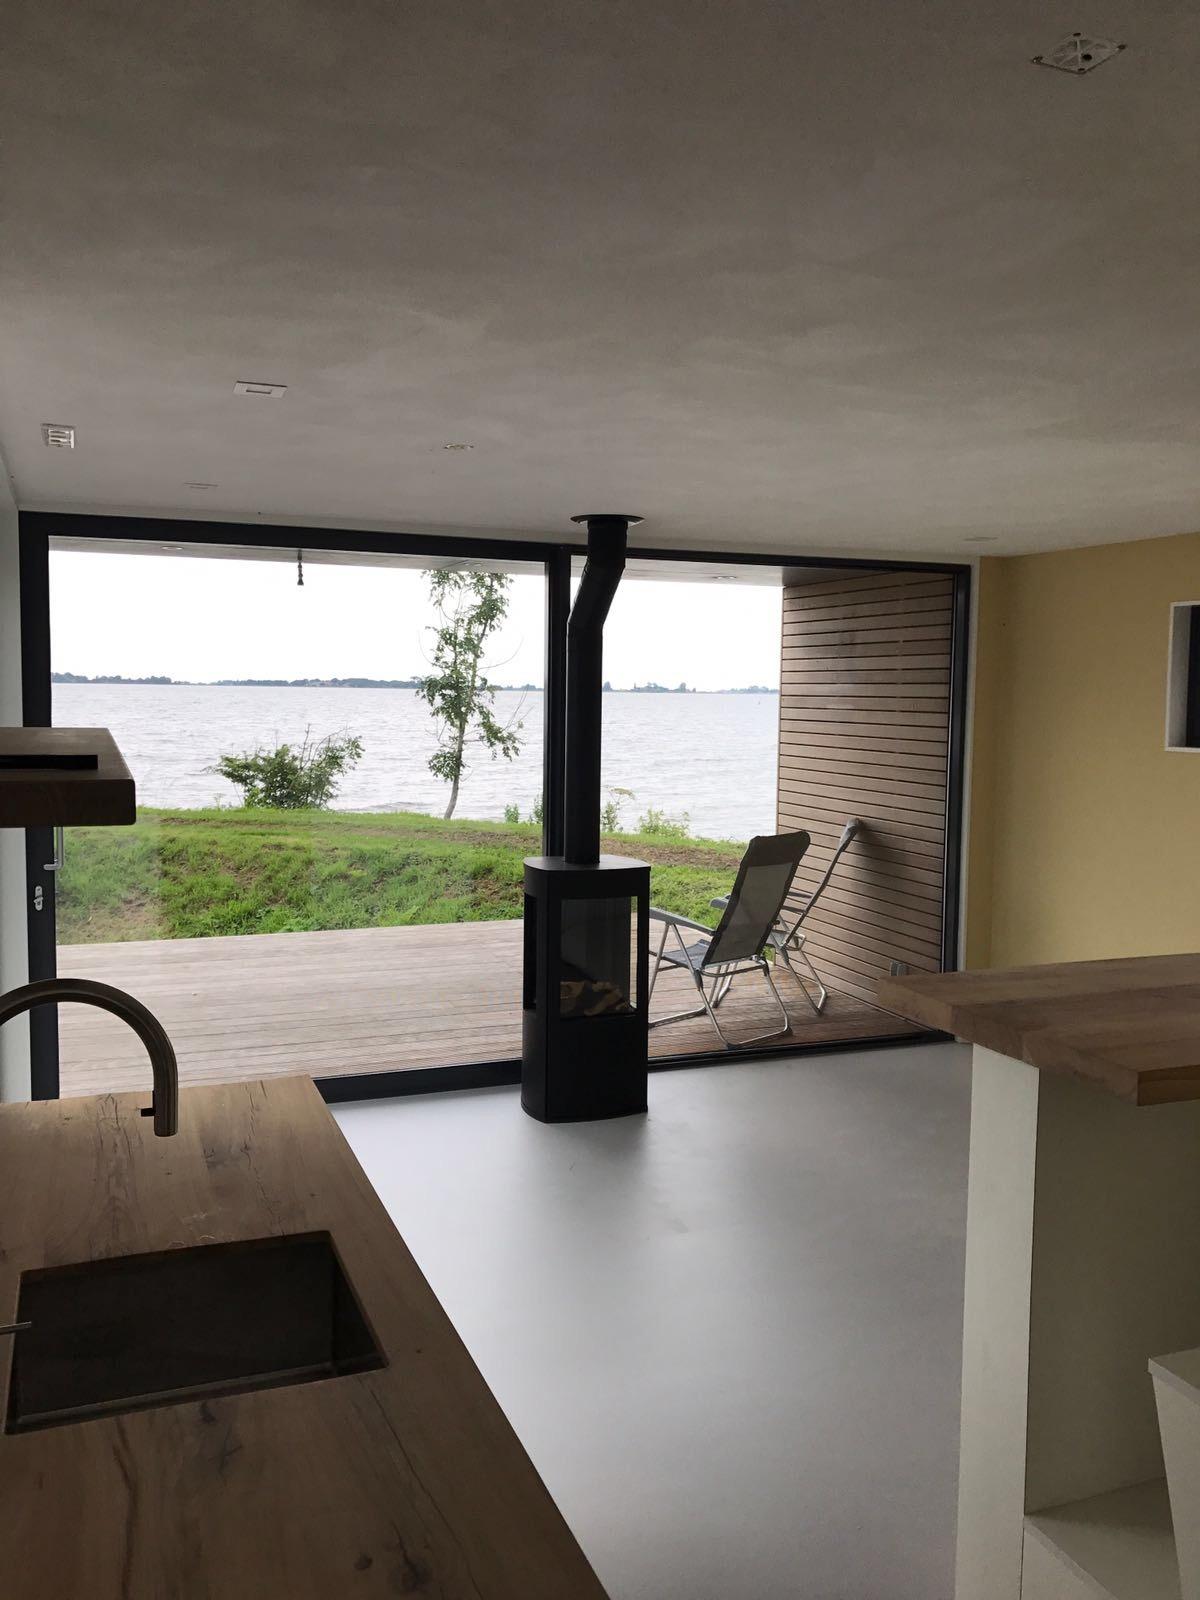 21 Vakantiewoningen Te Elahuizen 2